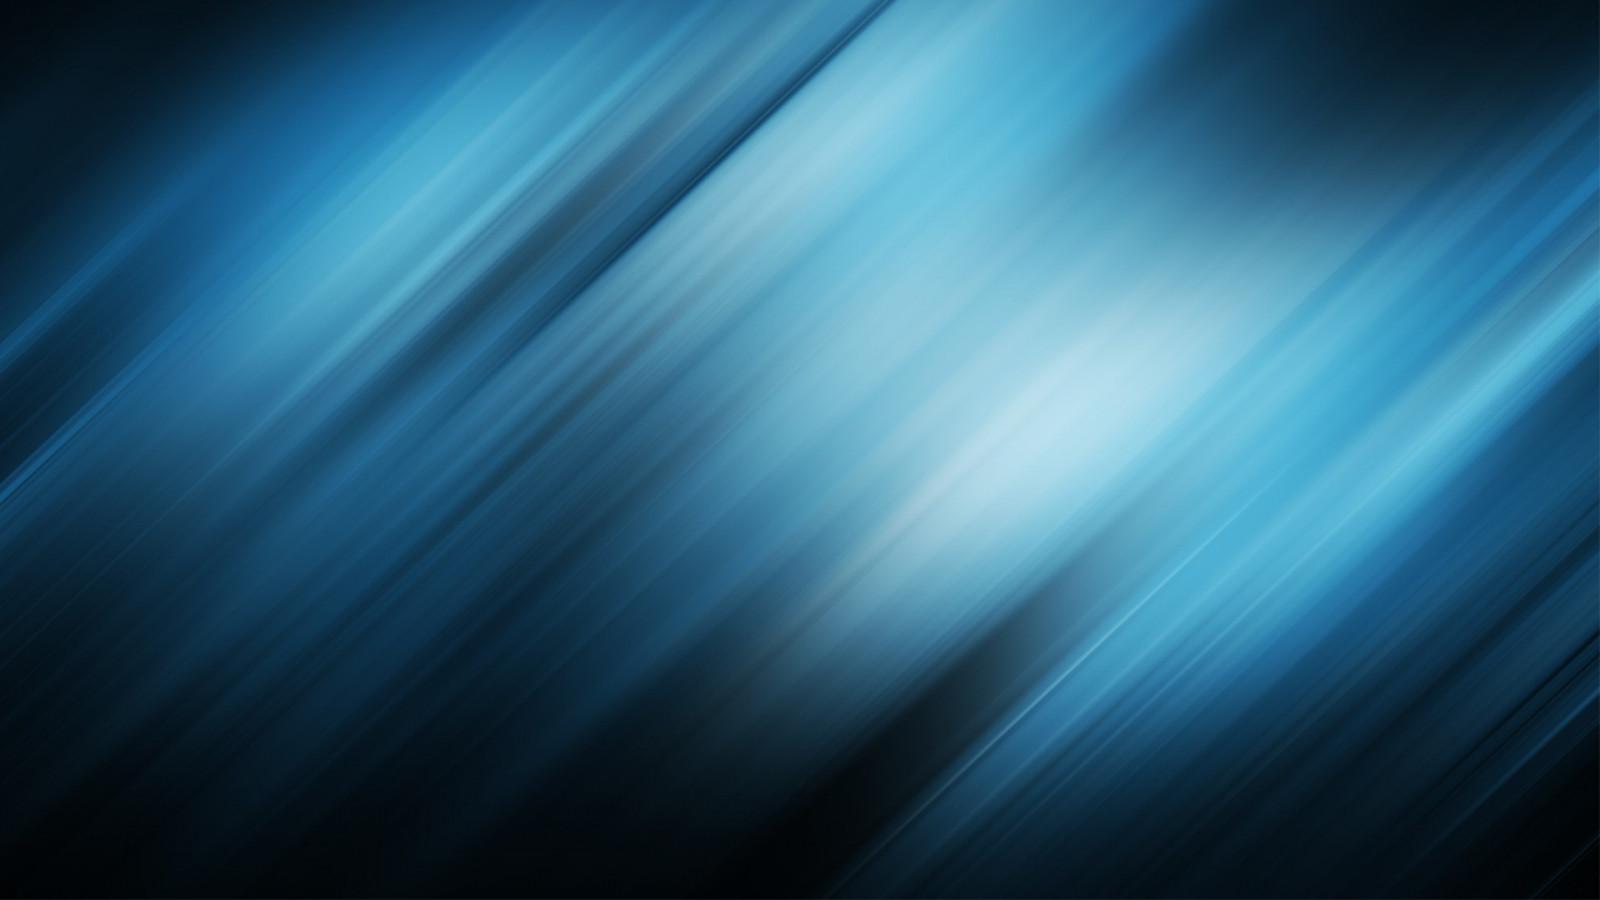 Wallpaper : sunlight, simple background, blue, texture ...